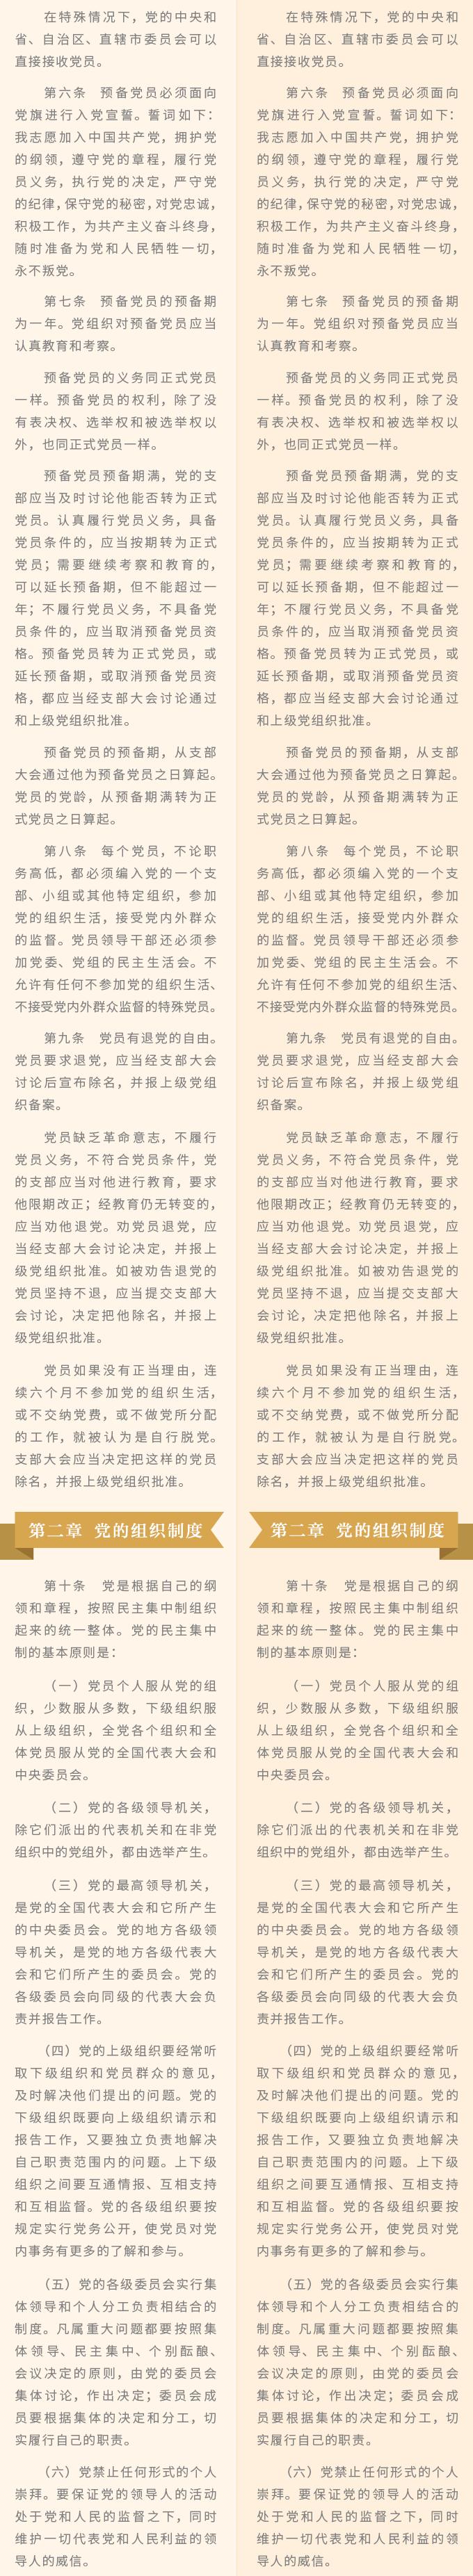 http://www.ccdi.gov.cn/yw/201710/W020171031664657839096.png